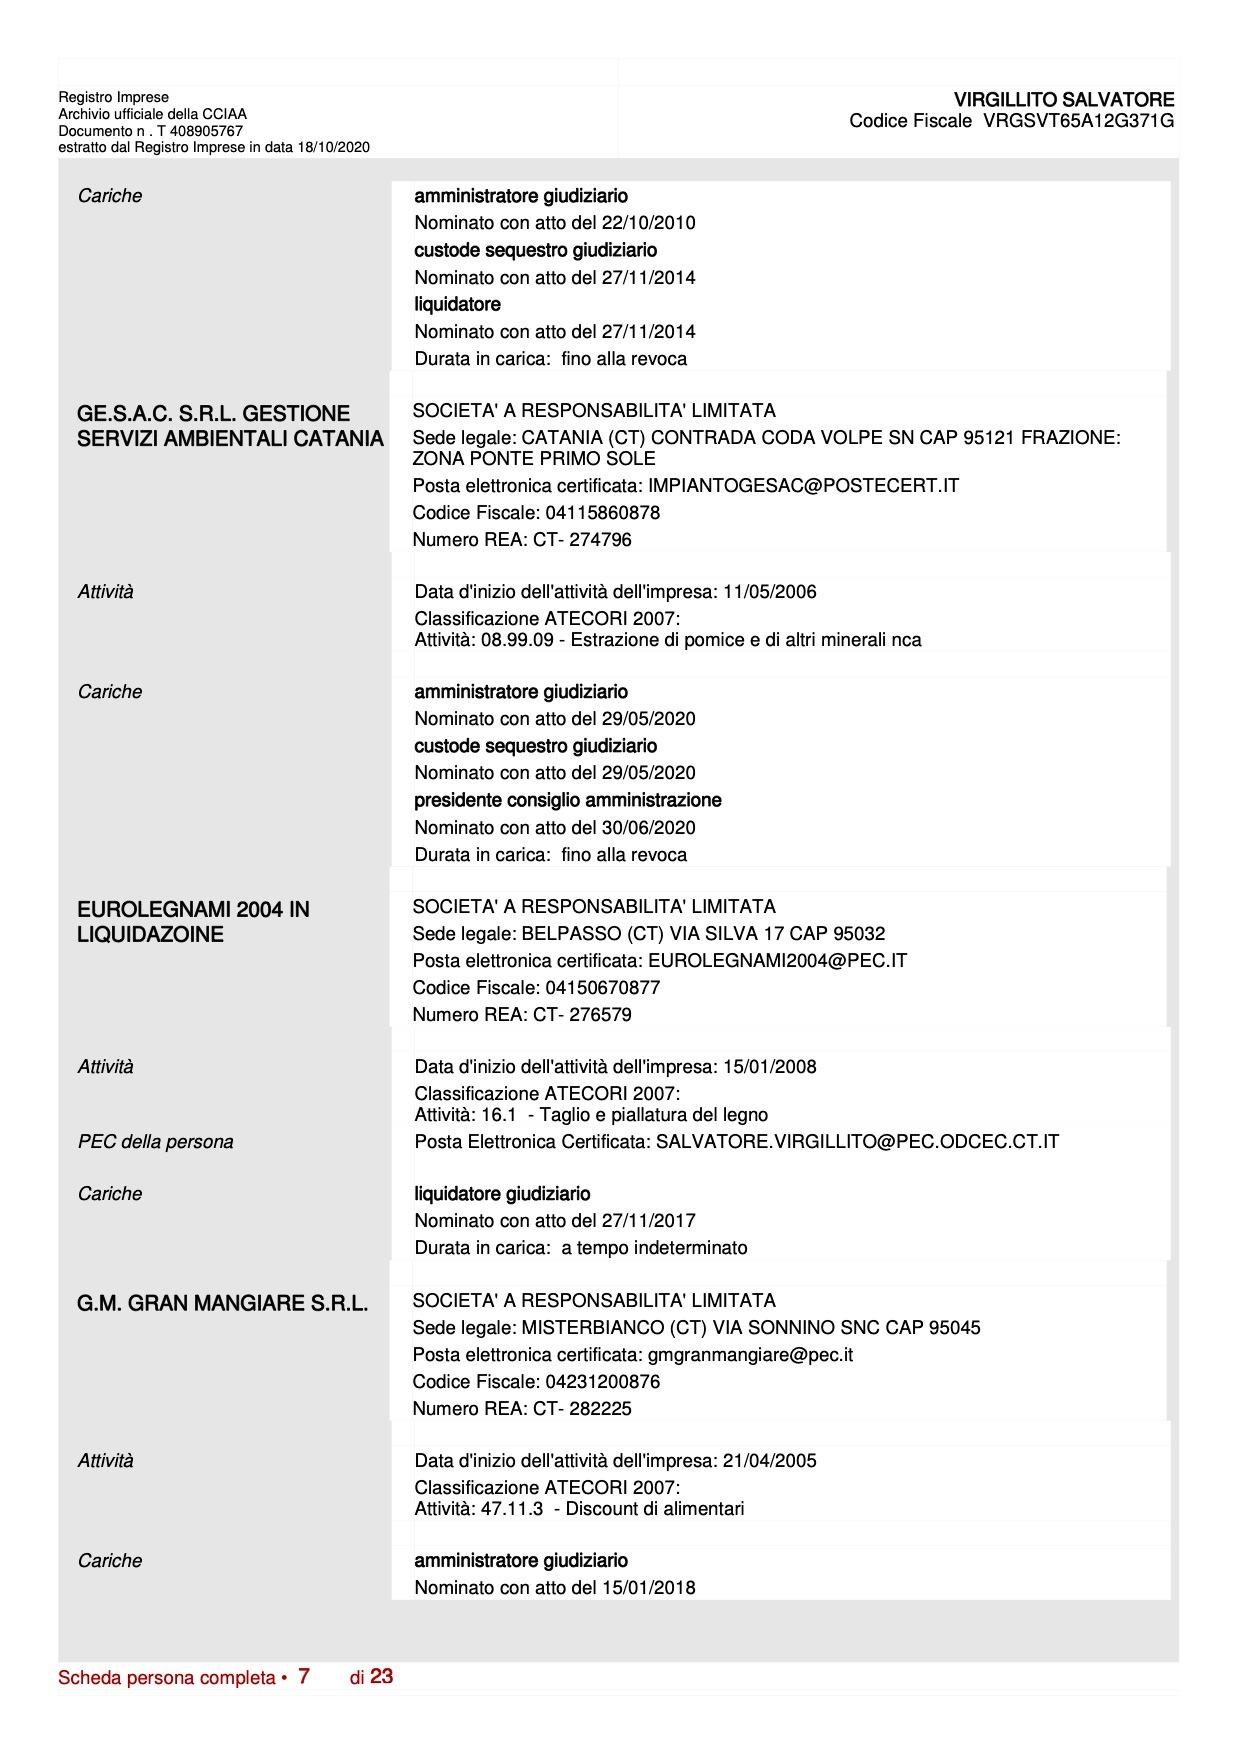 virgillitosalvatore7-1603425668.jpg